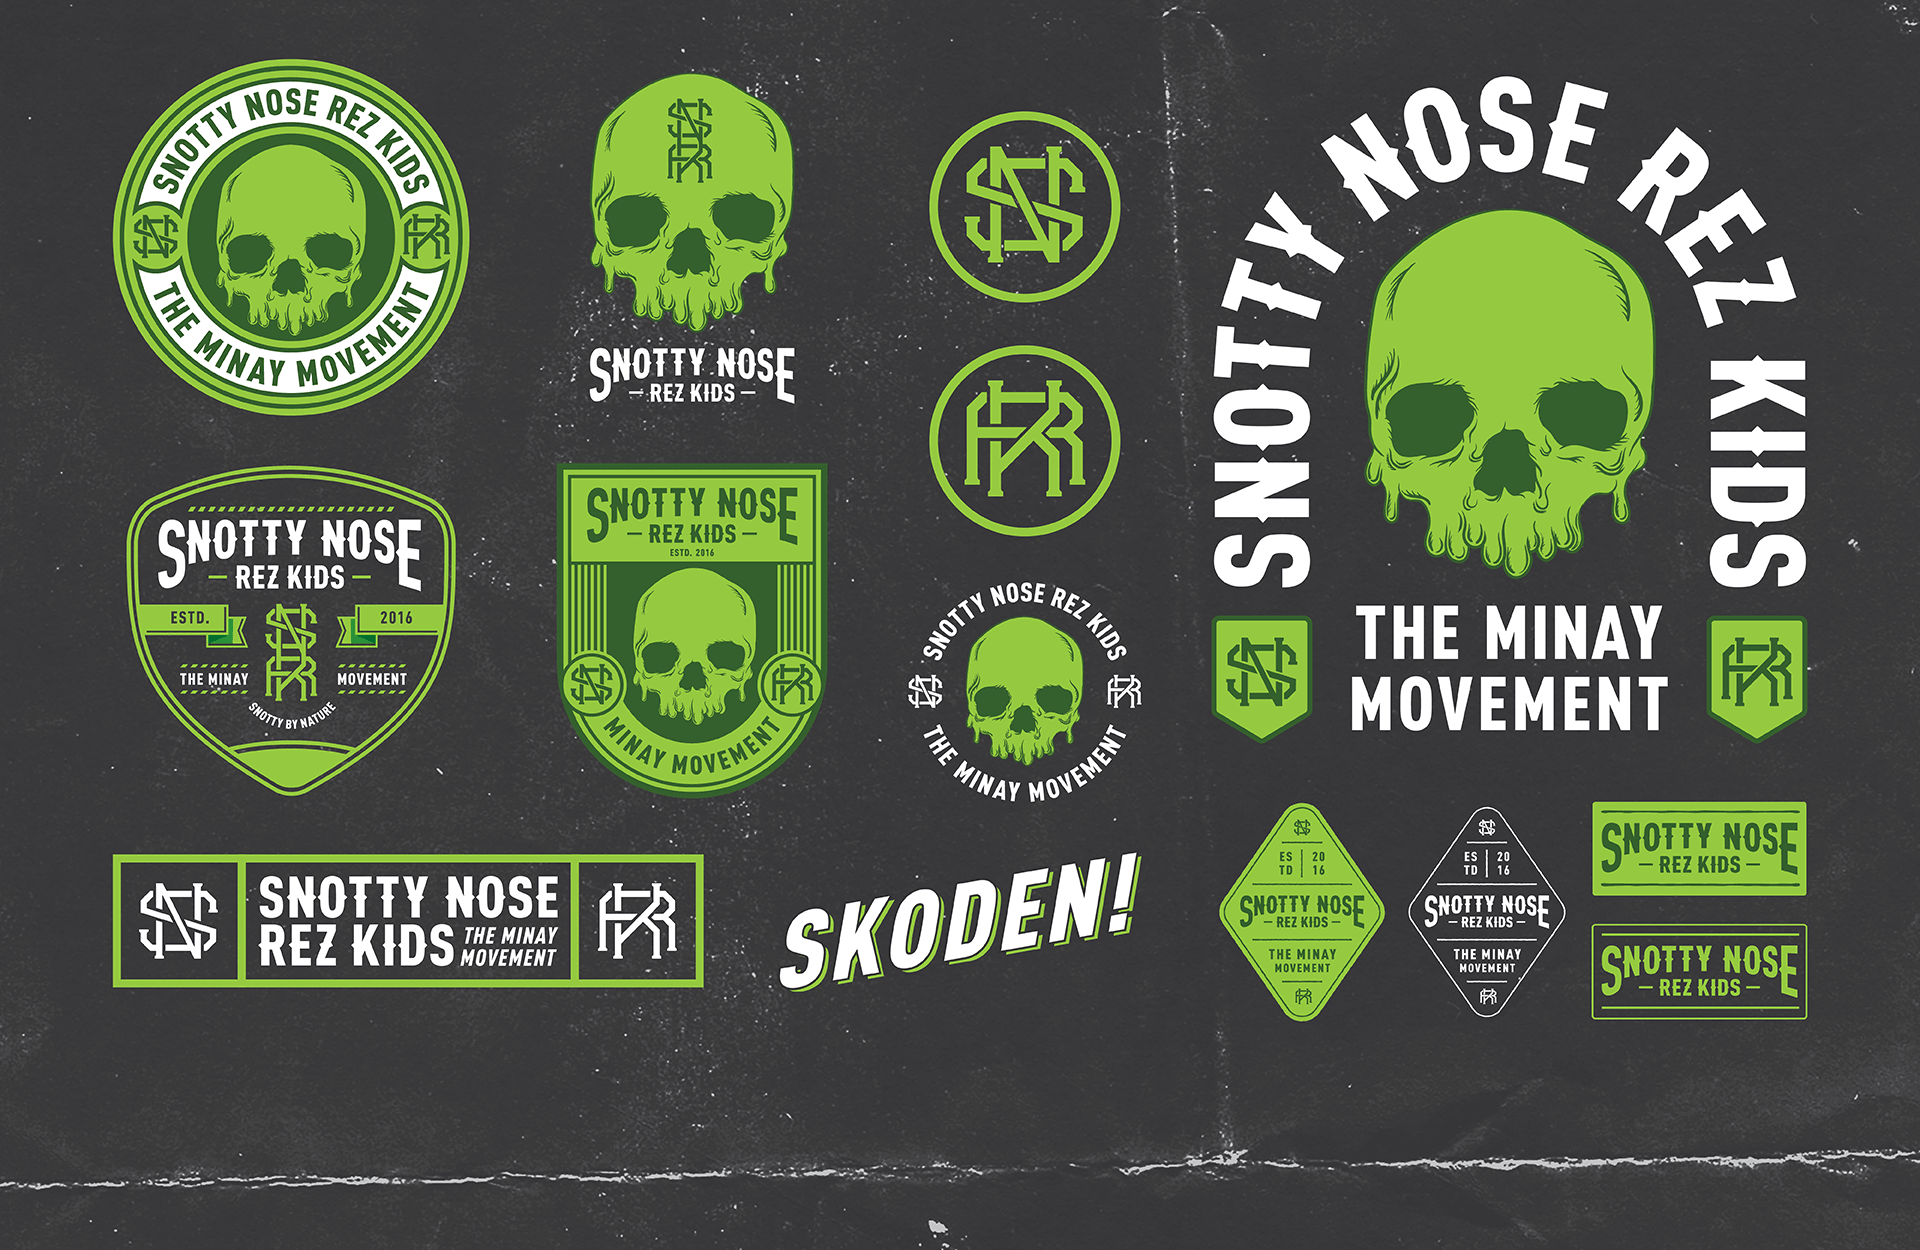 Snotty Nose Rez Kids | Logos, Badges, Branding Flash Sheet Design